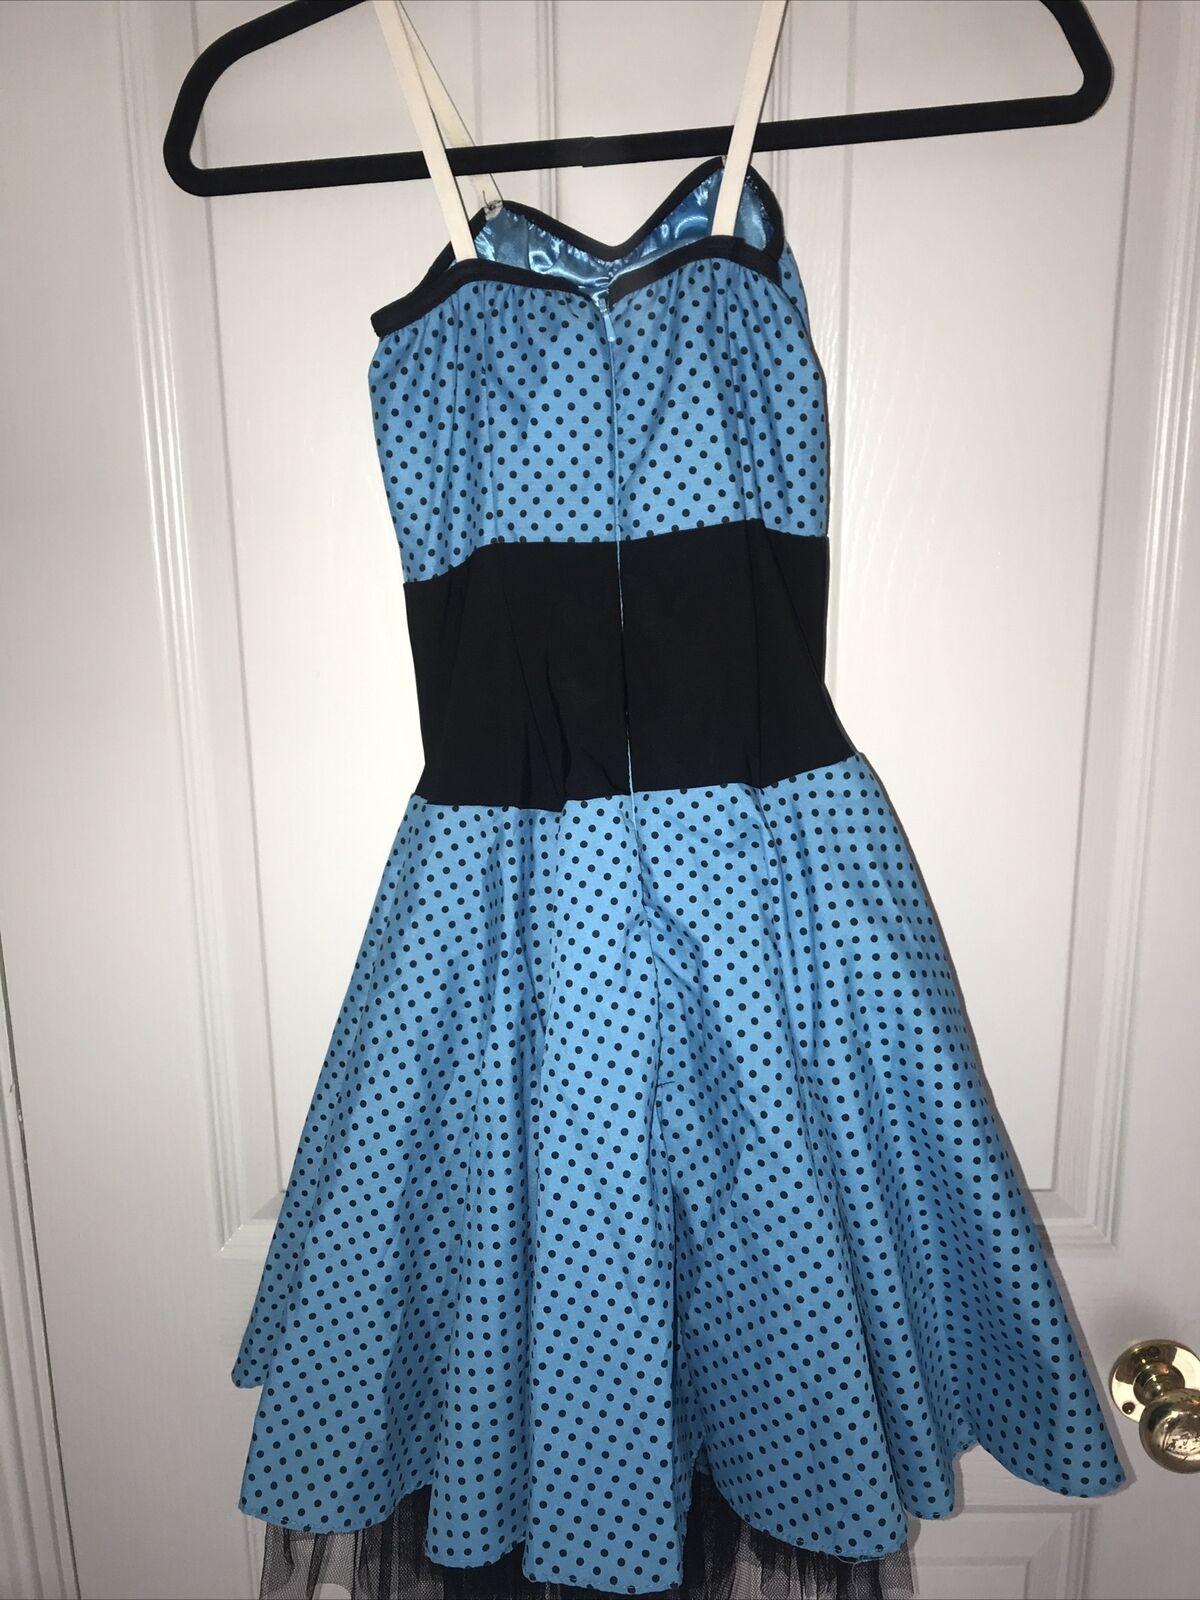 Dance costume one piece dress tutu polka dot blue and black W Matching Headband